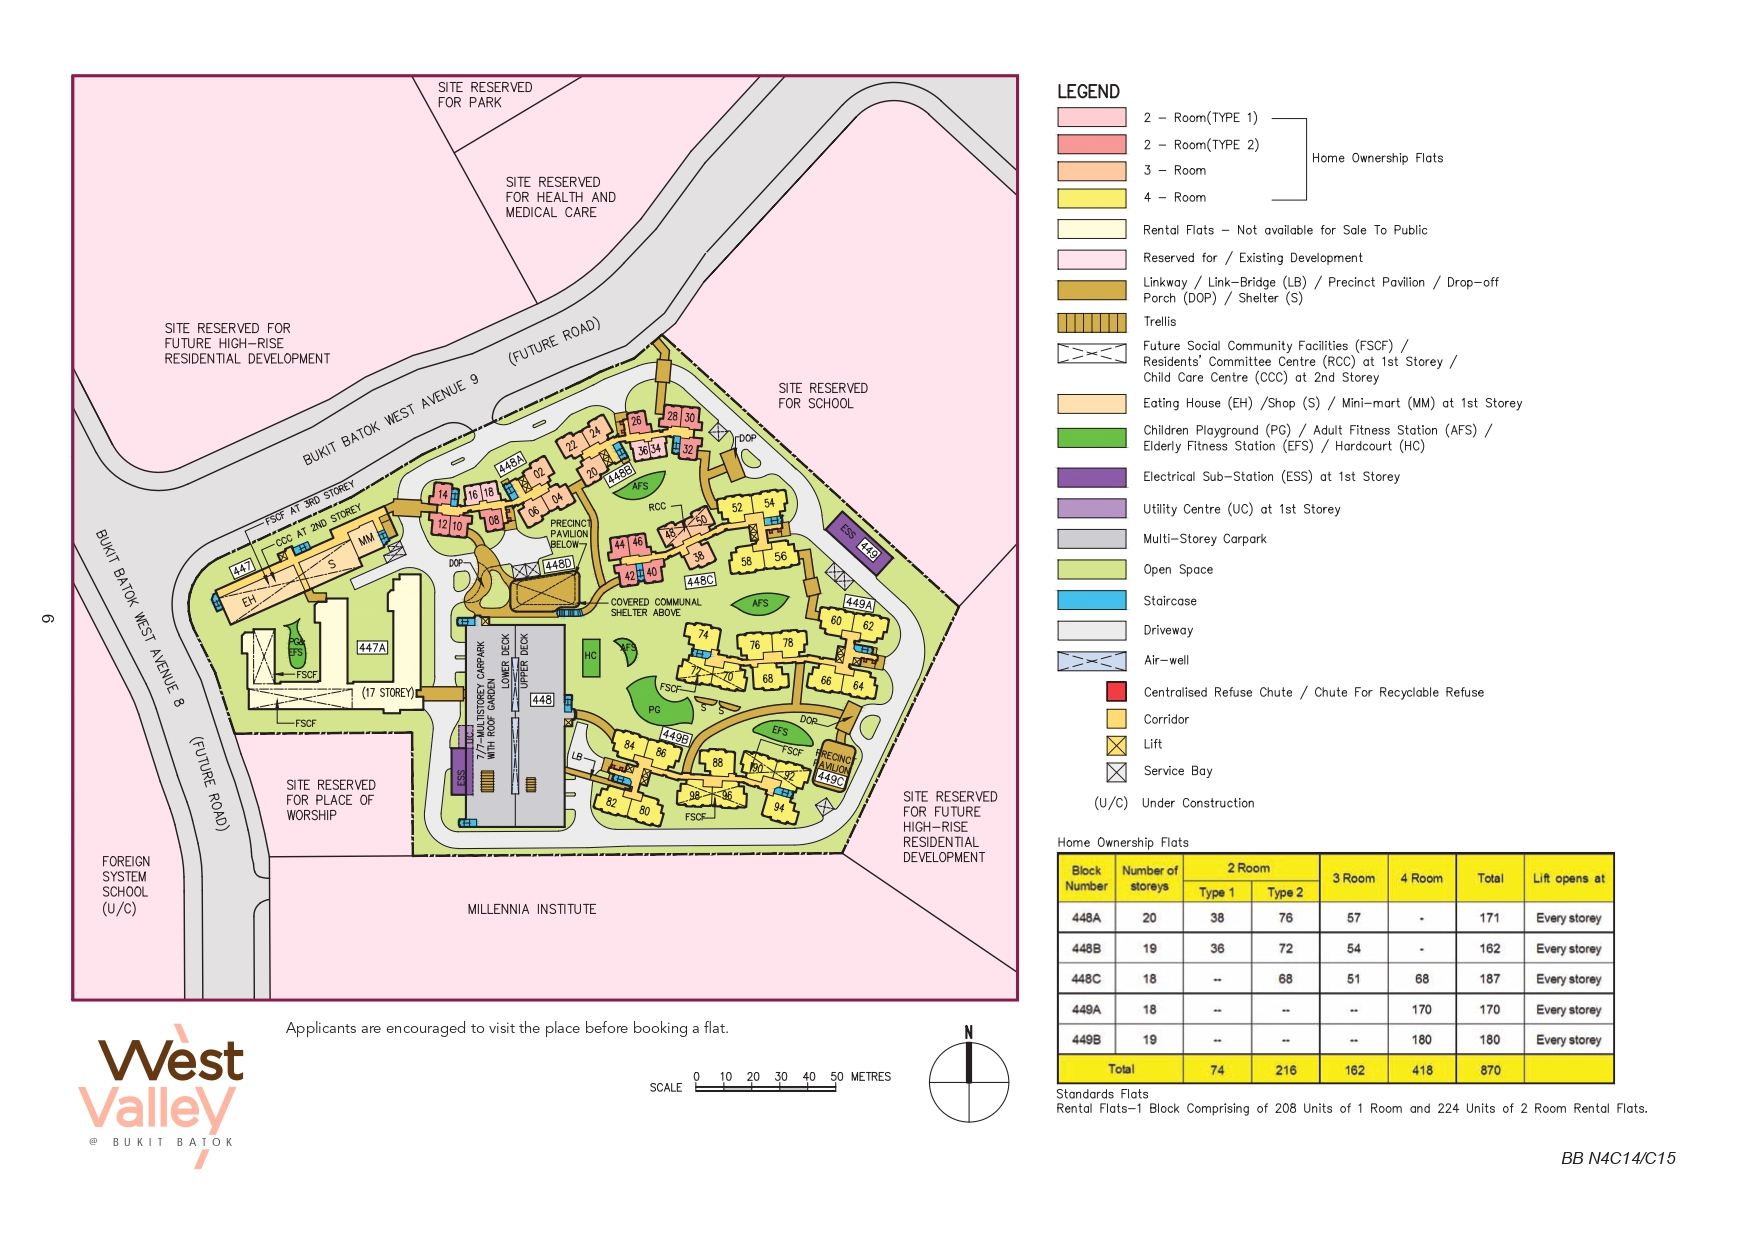 West Valley @ Bukit Batok Site Plan